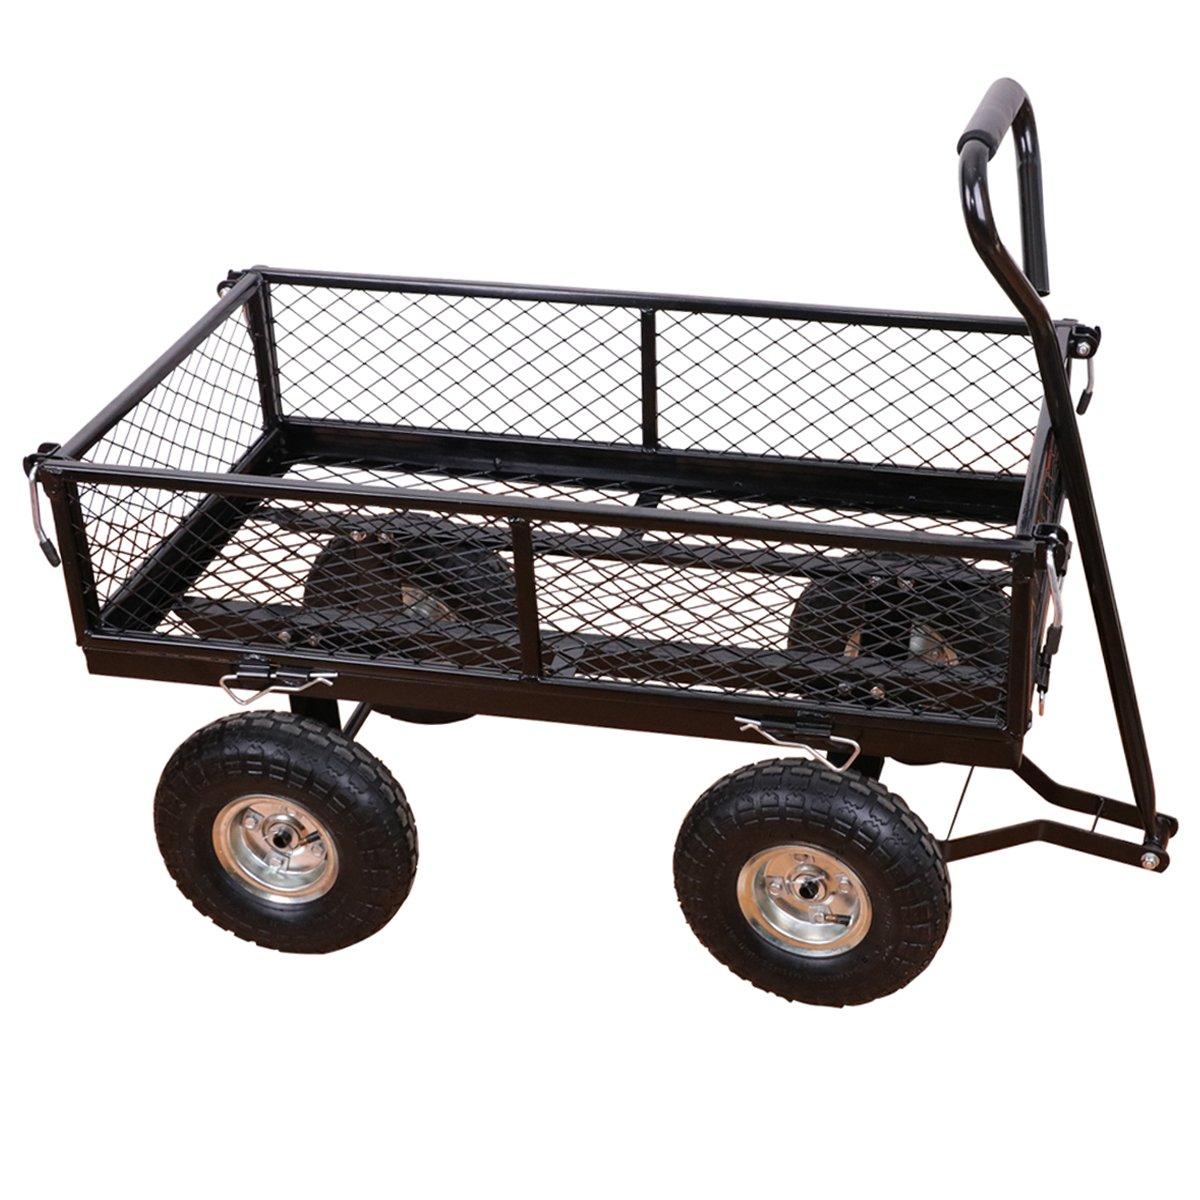 Yardeen LAGUNA Steel Wagon Cart Heavy Duty Outdoor Large Garden Trolley Load Capacity 400LB Color Black